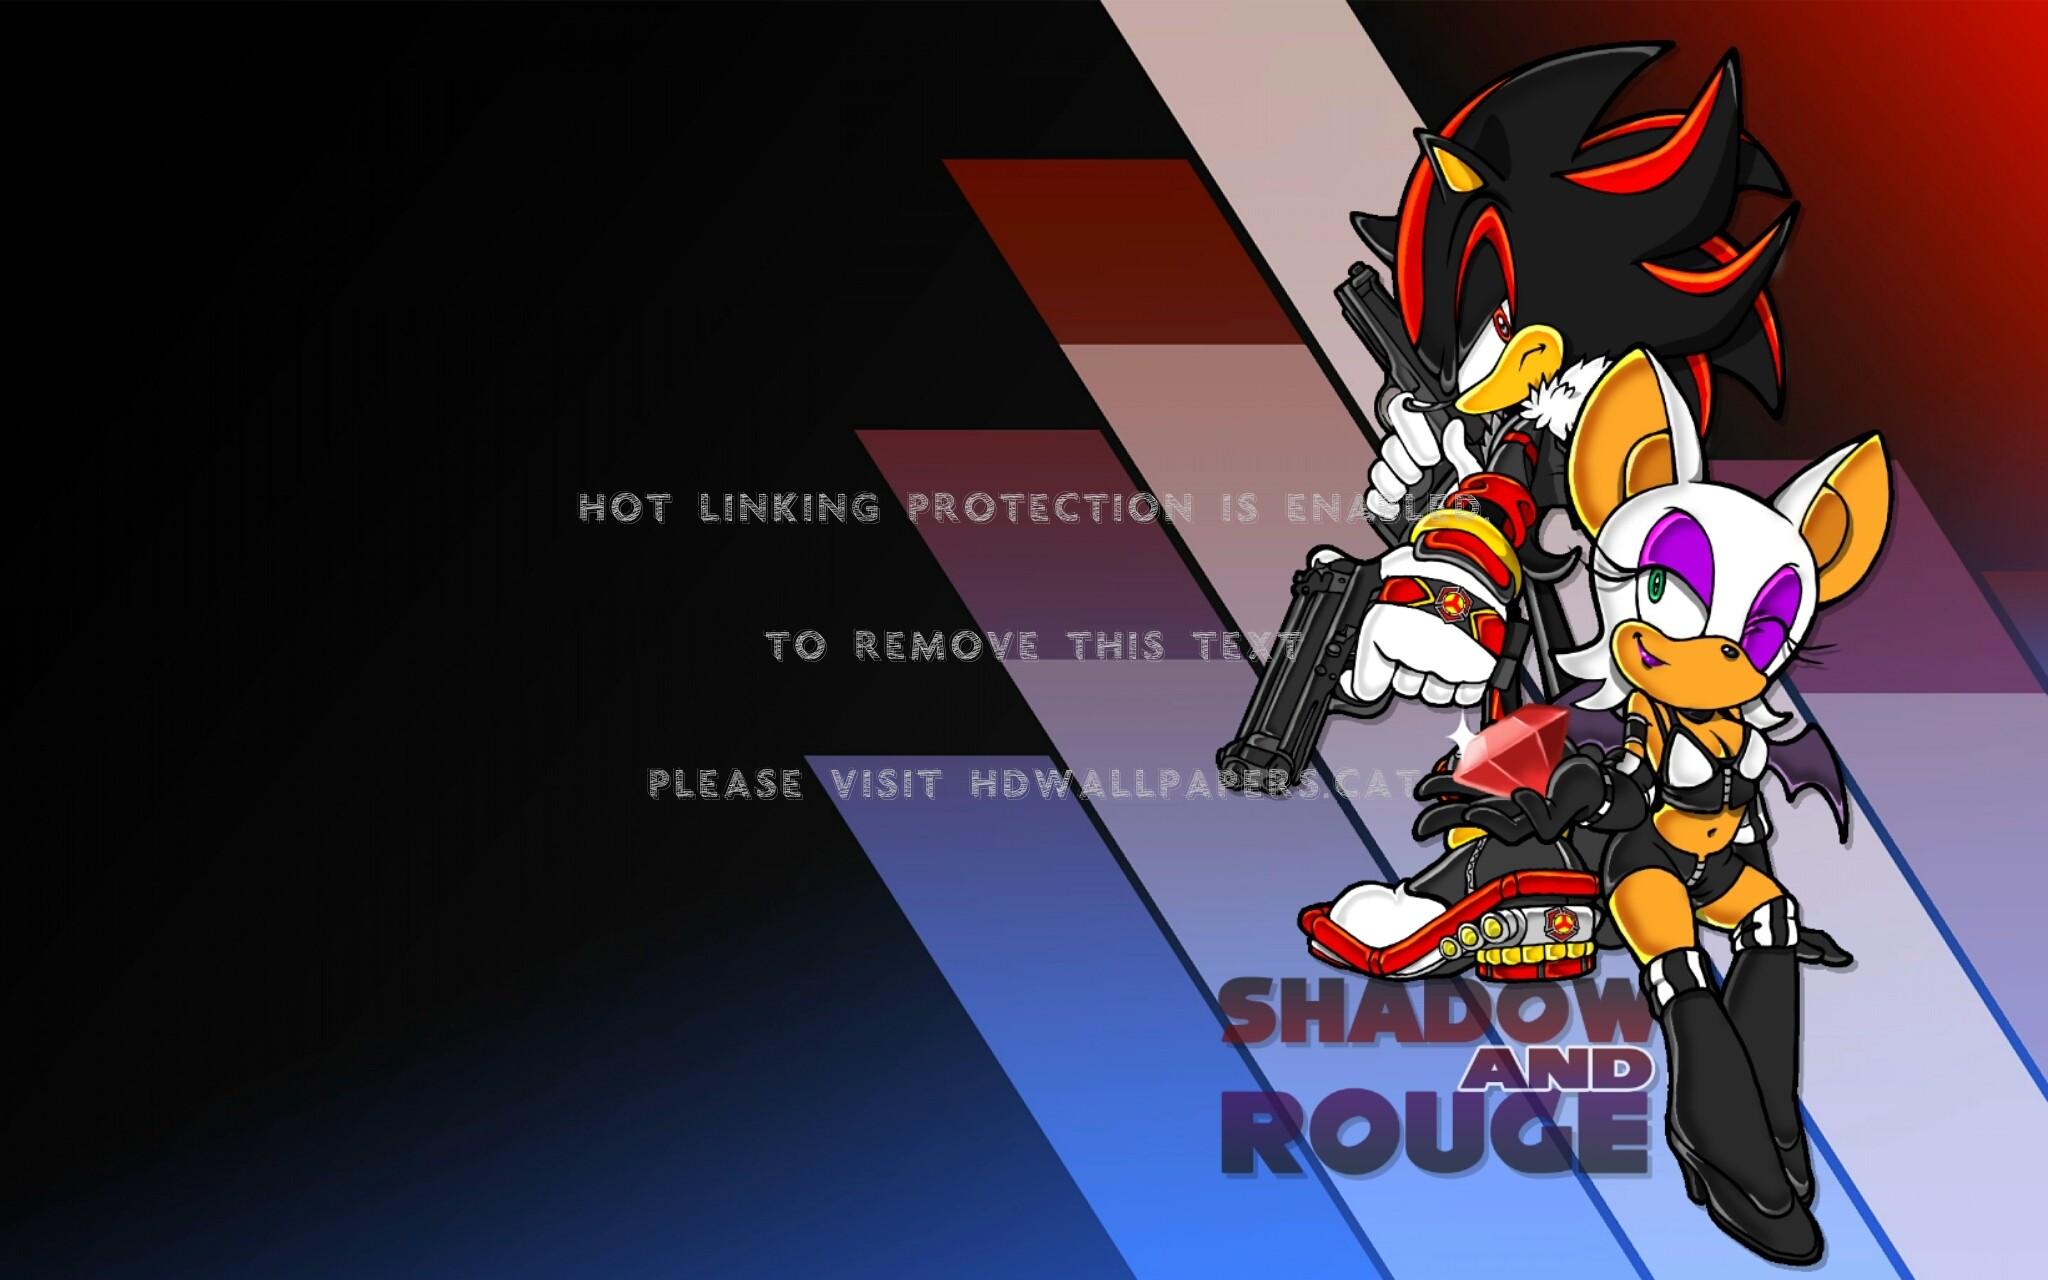 Rouge The Bat Wallpaper 70 Images